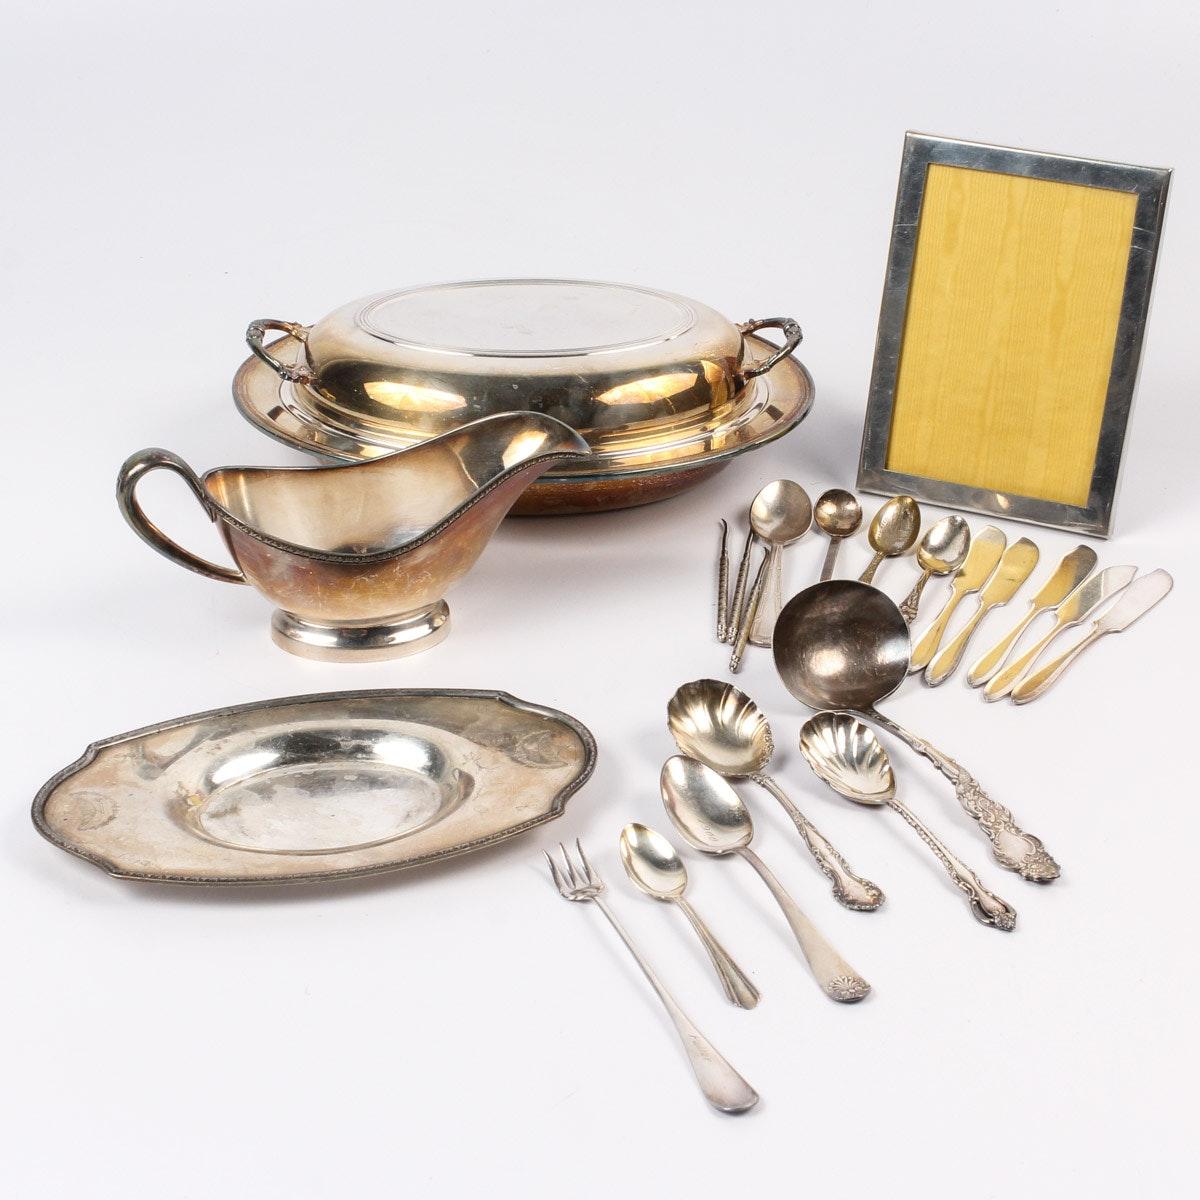 Silver Plate Serveware and Accessories